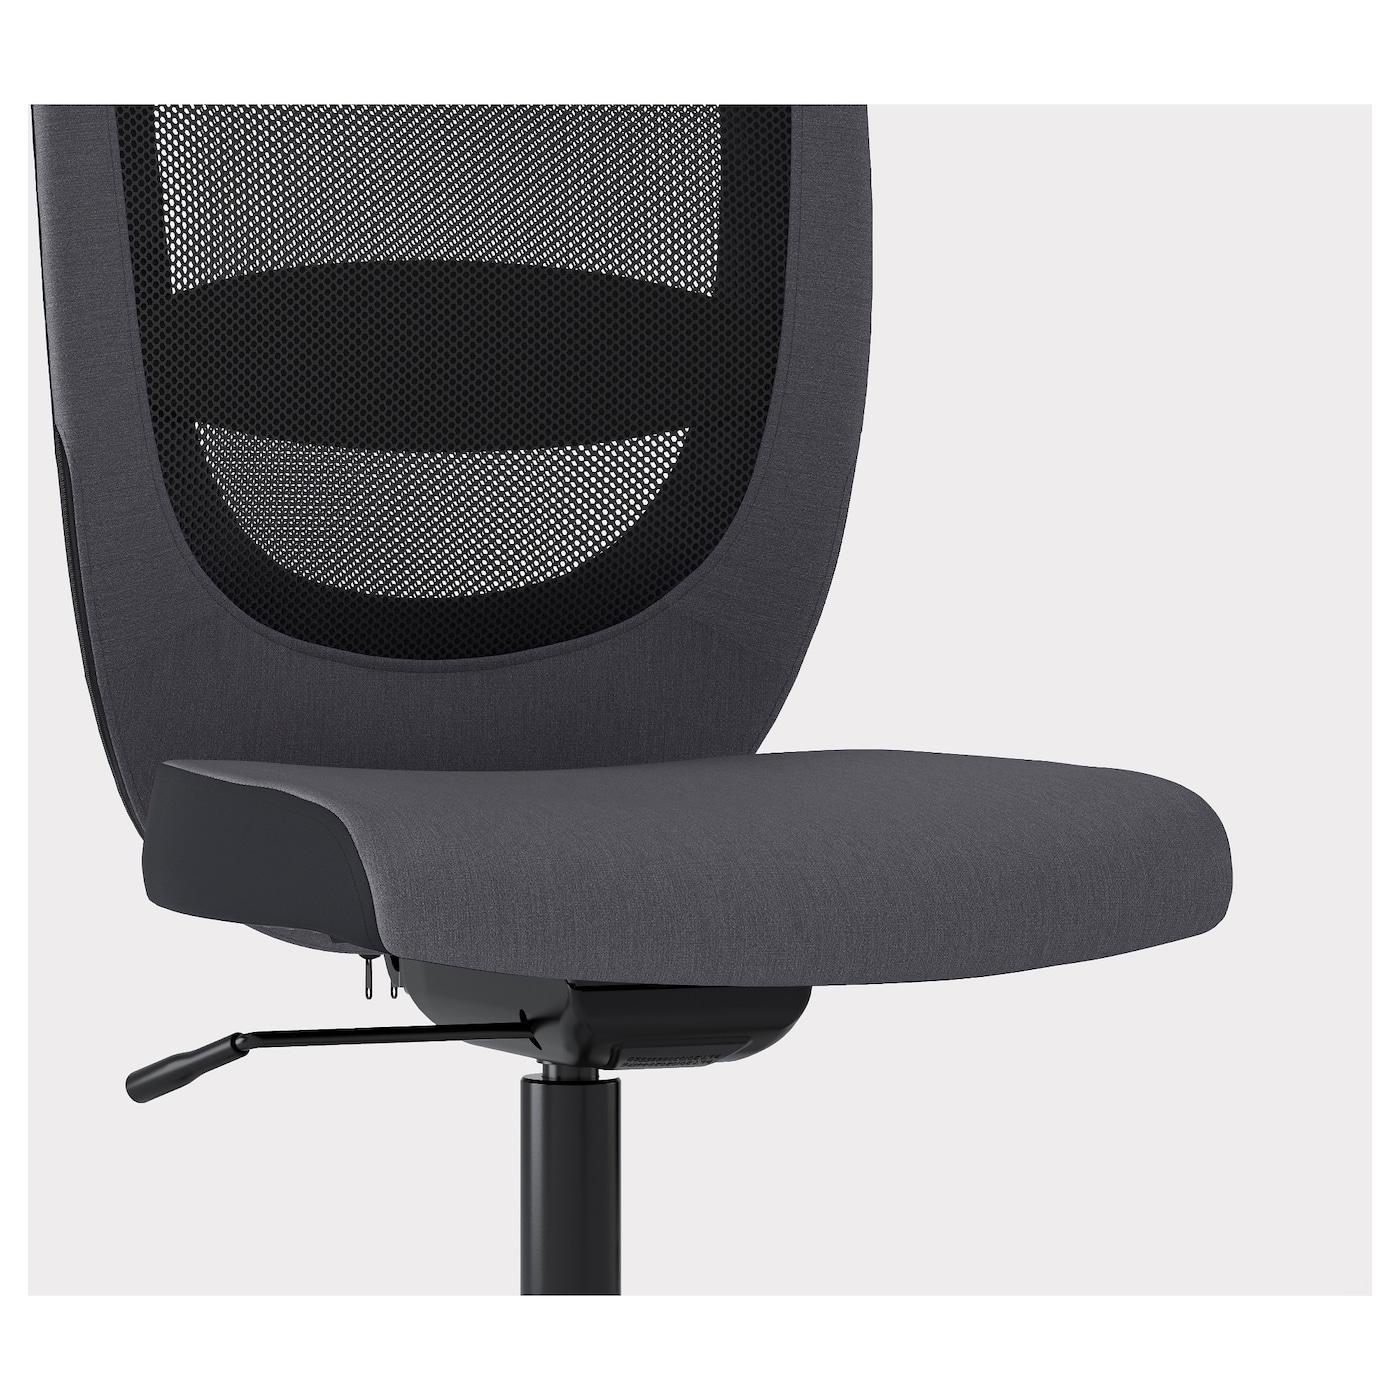 swivel elizabeth hayneedle pointe cfm chairs chair master product comfort